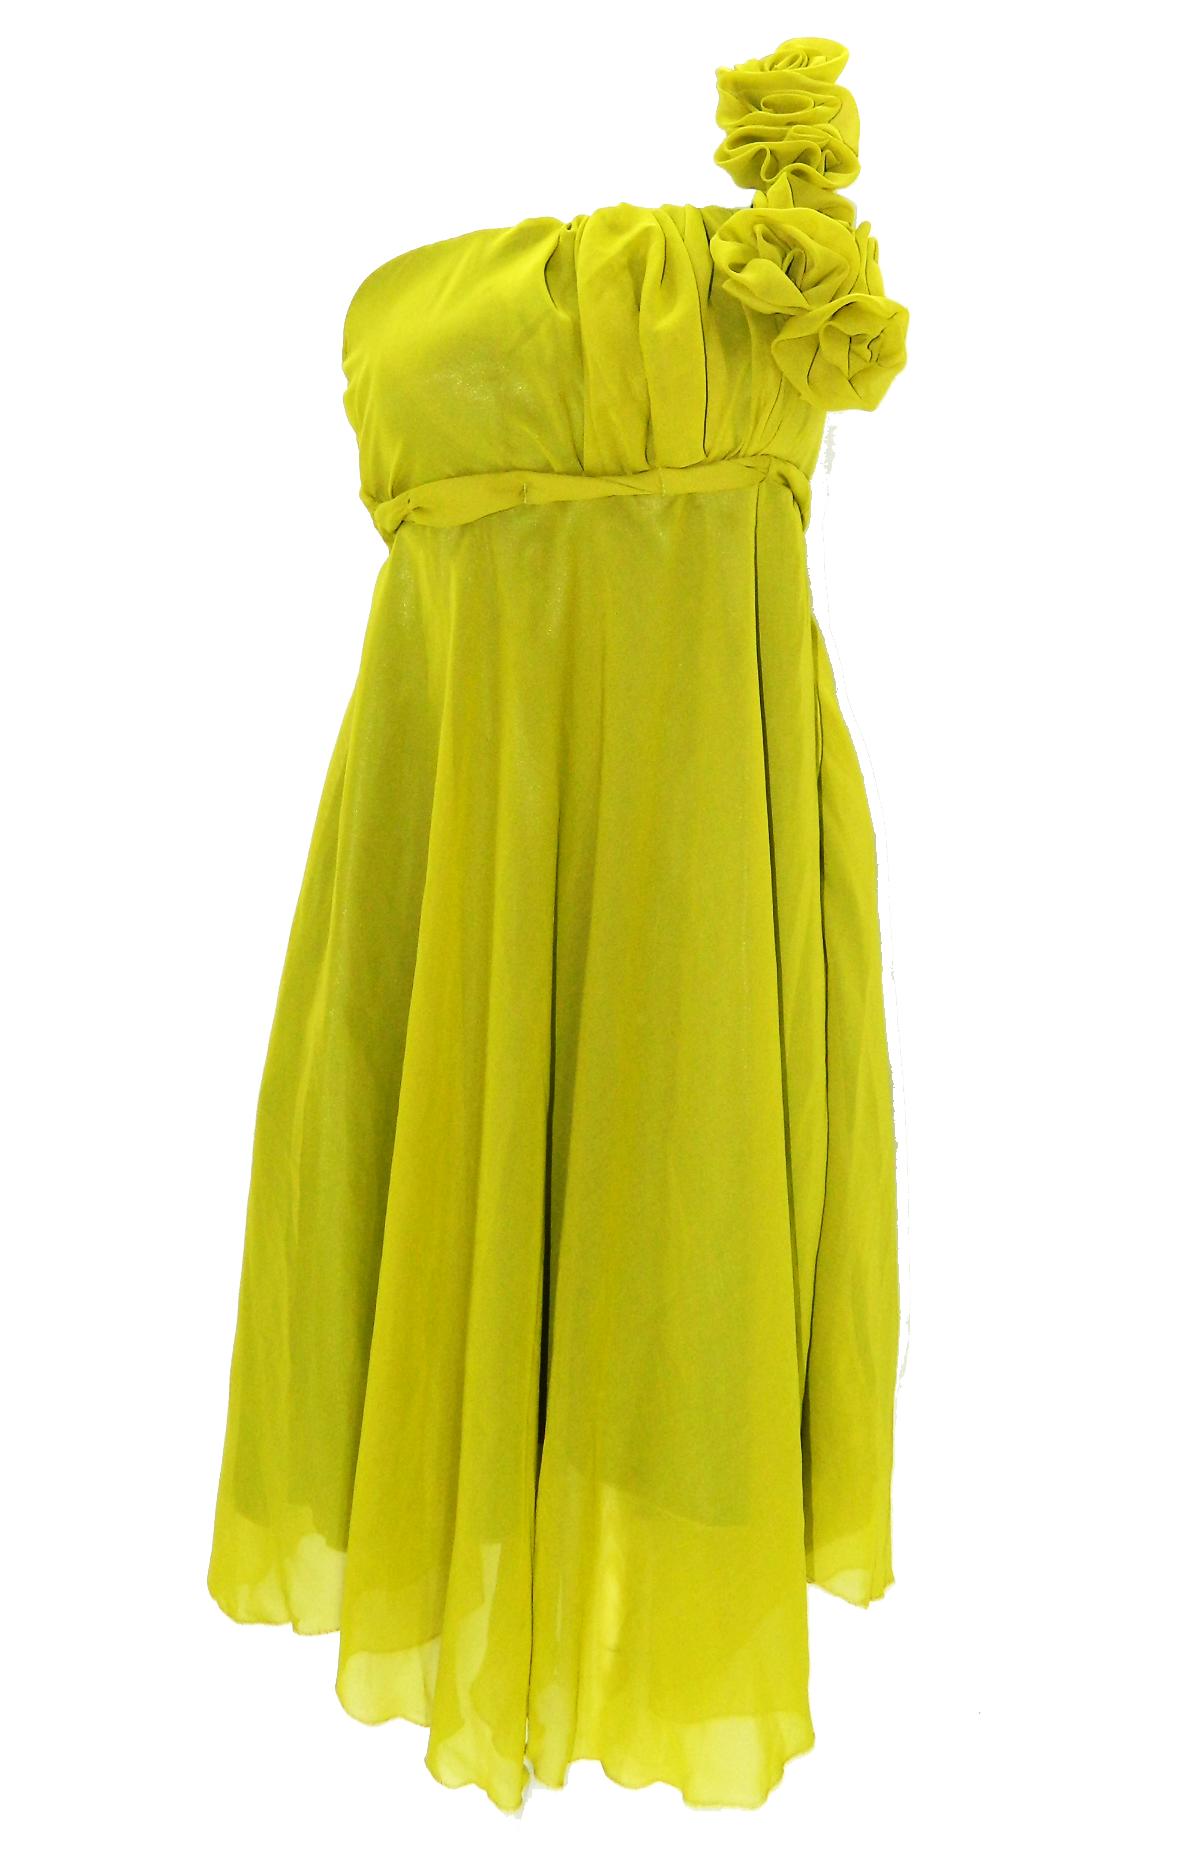 Dresses Png image #26105 - Dress PNG